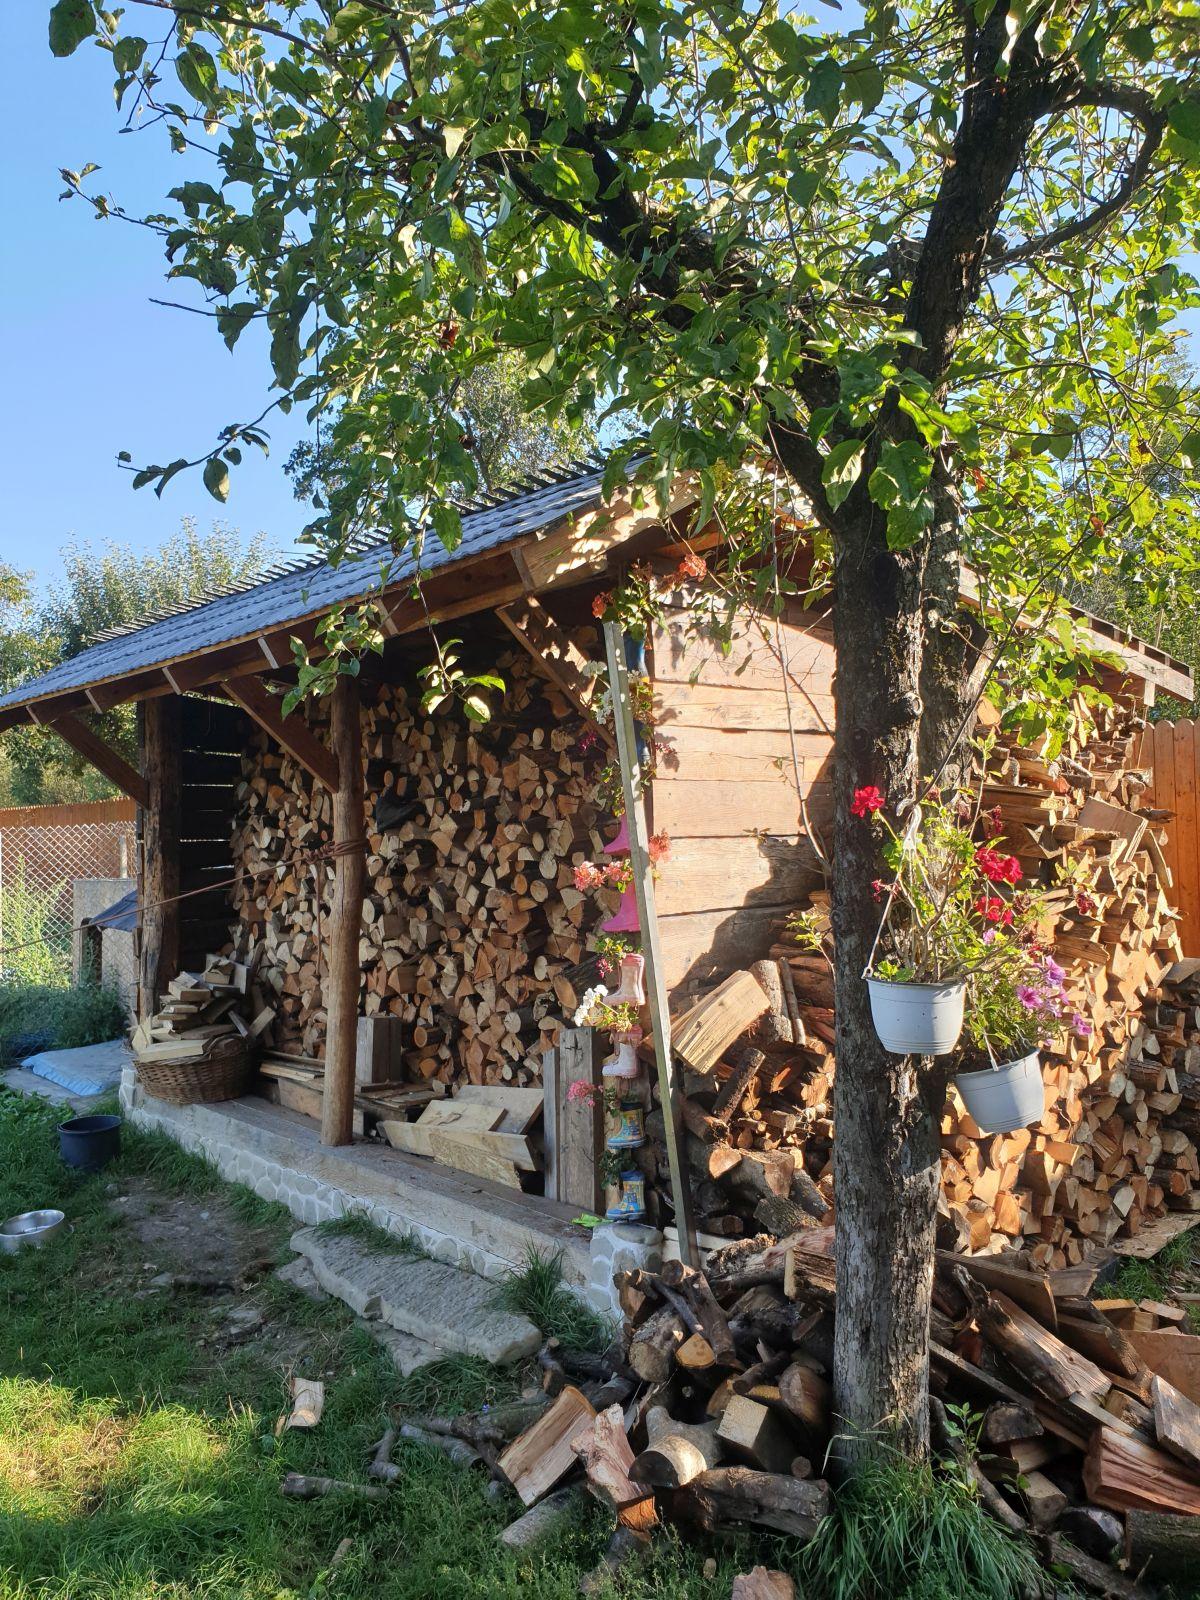 adelaparvu.com despre magazie de lemne transformata in bucatarie, casa de lemn Romania, Foto Adela Parvu (9)